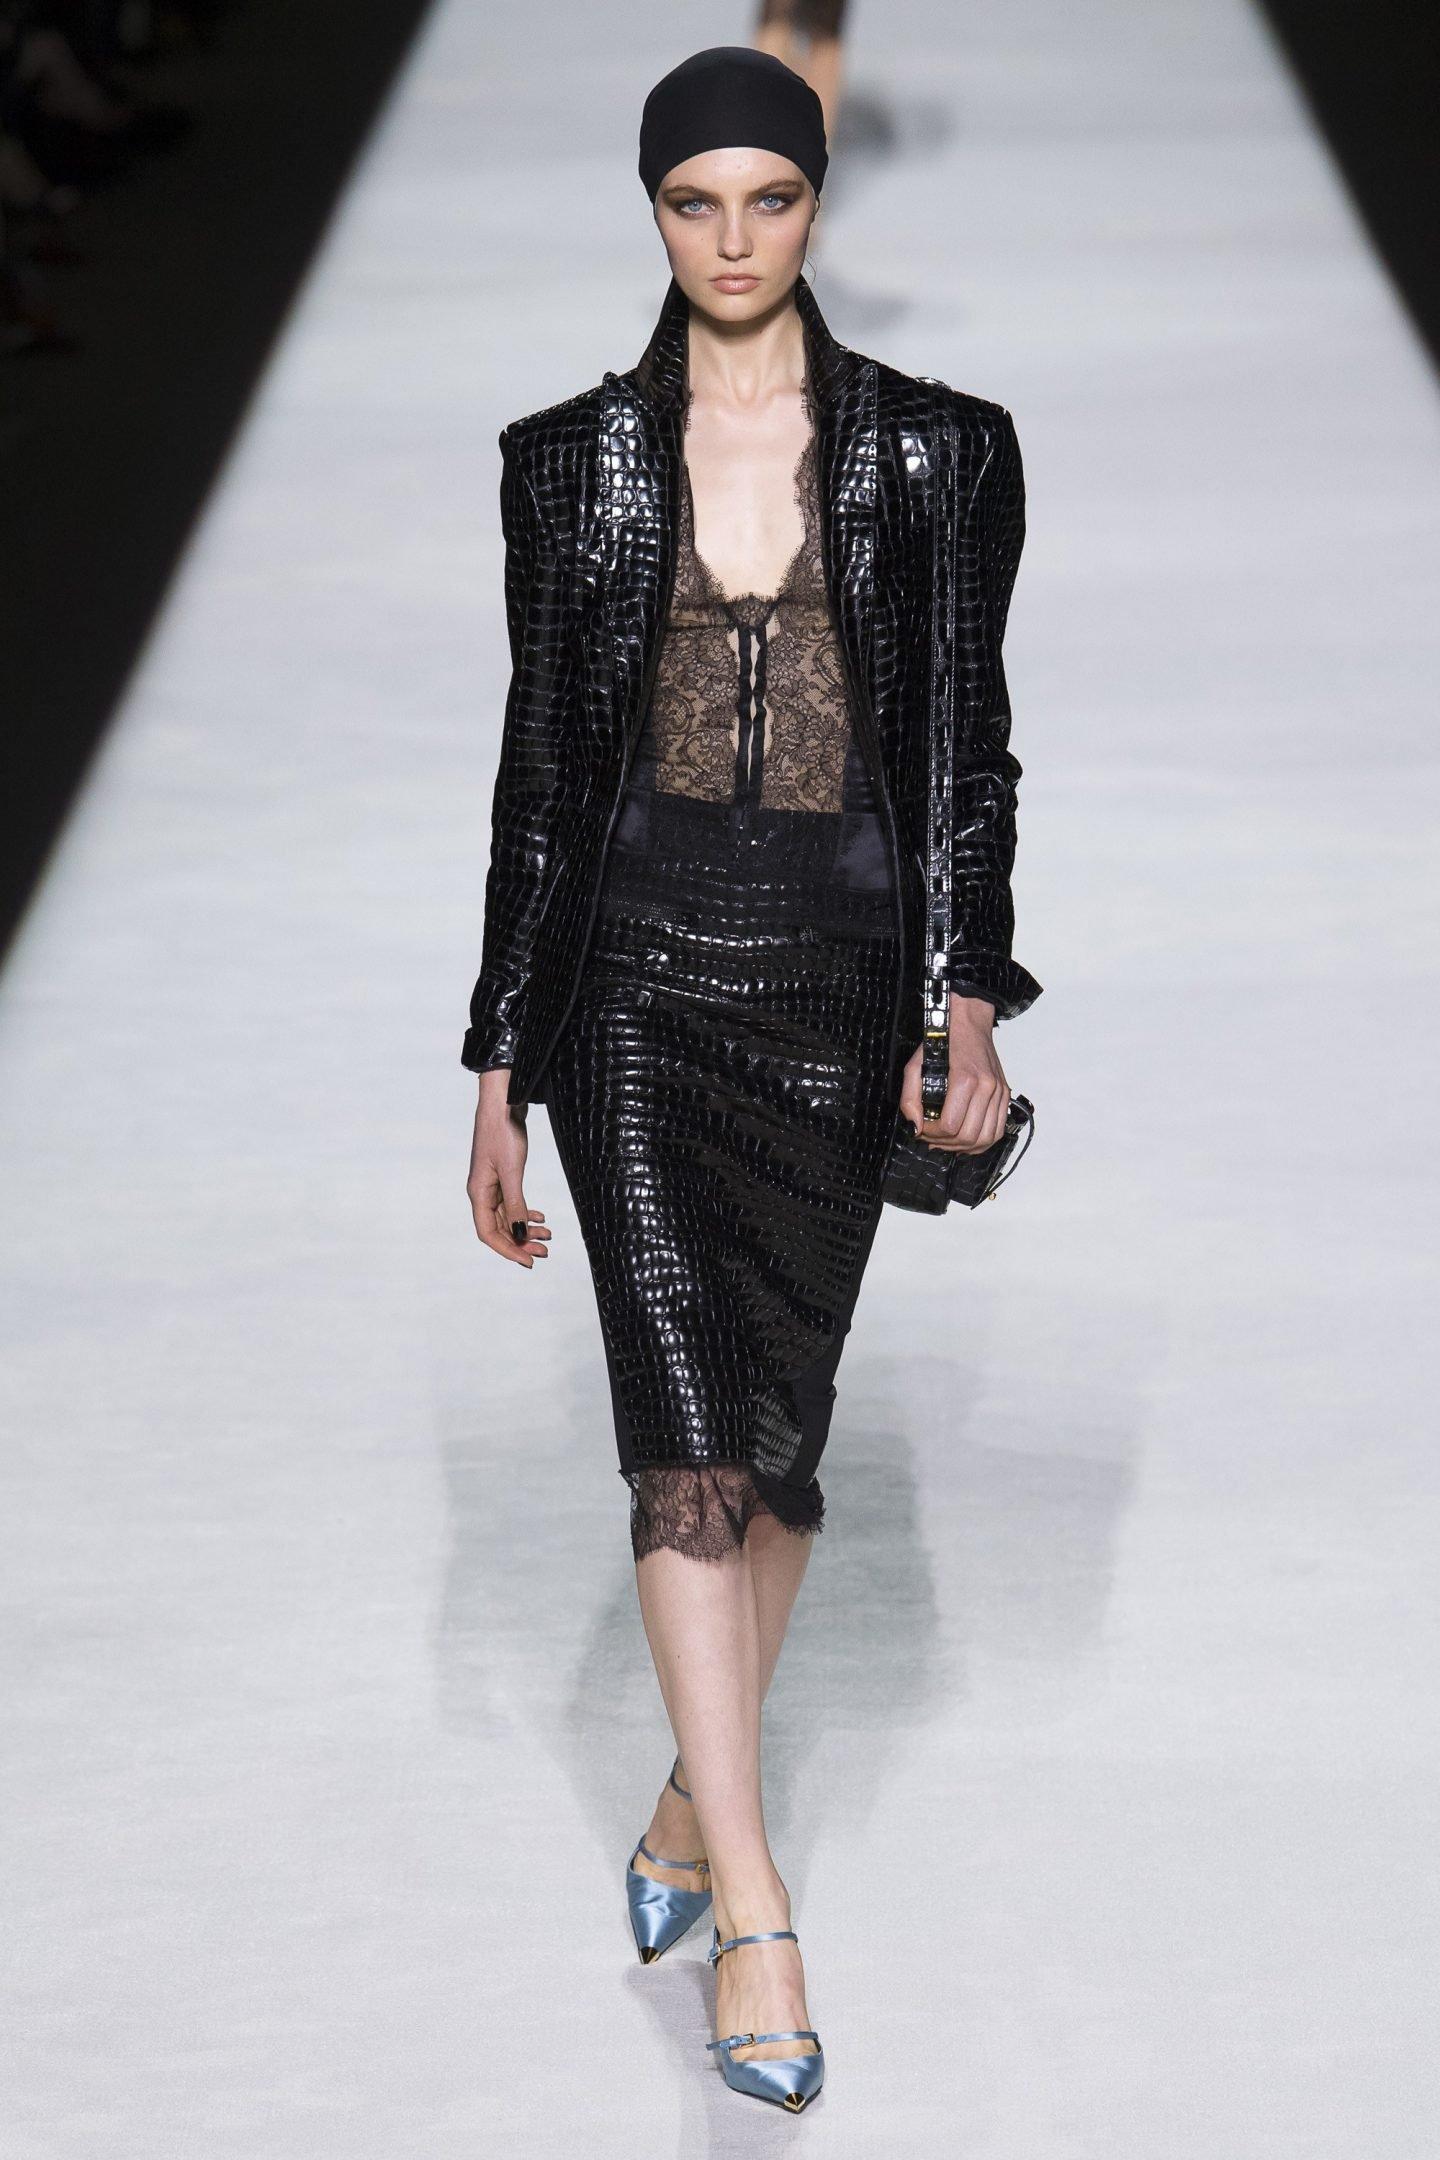 New York Fashion Week | Tom Ford | Image via vogue.com